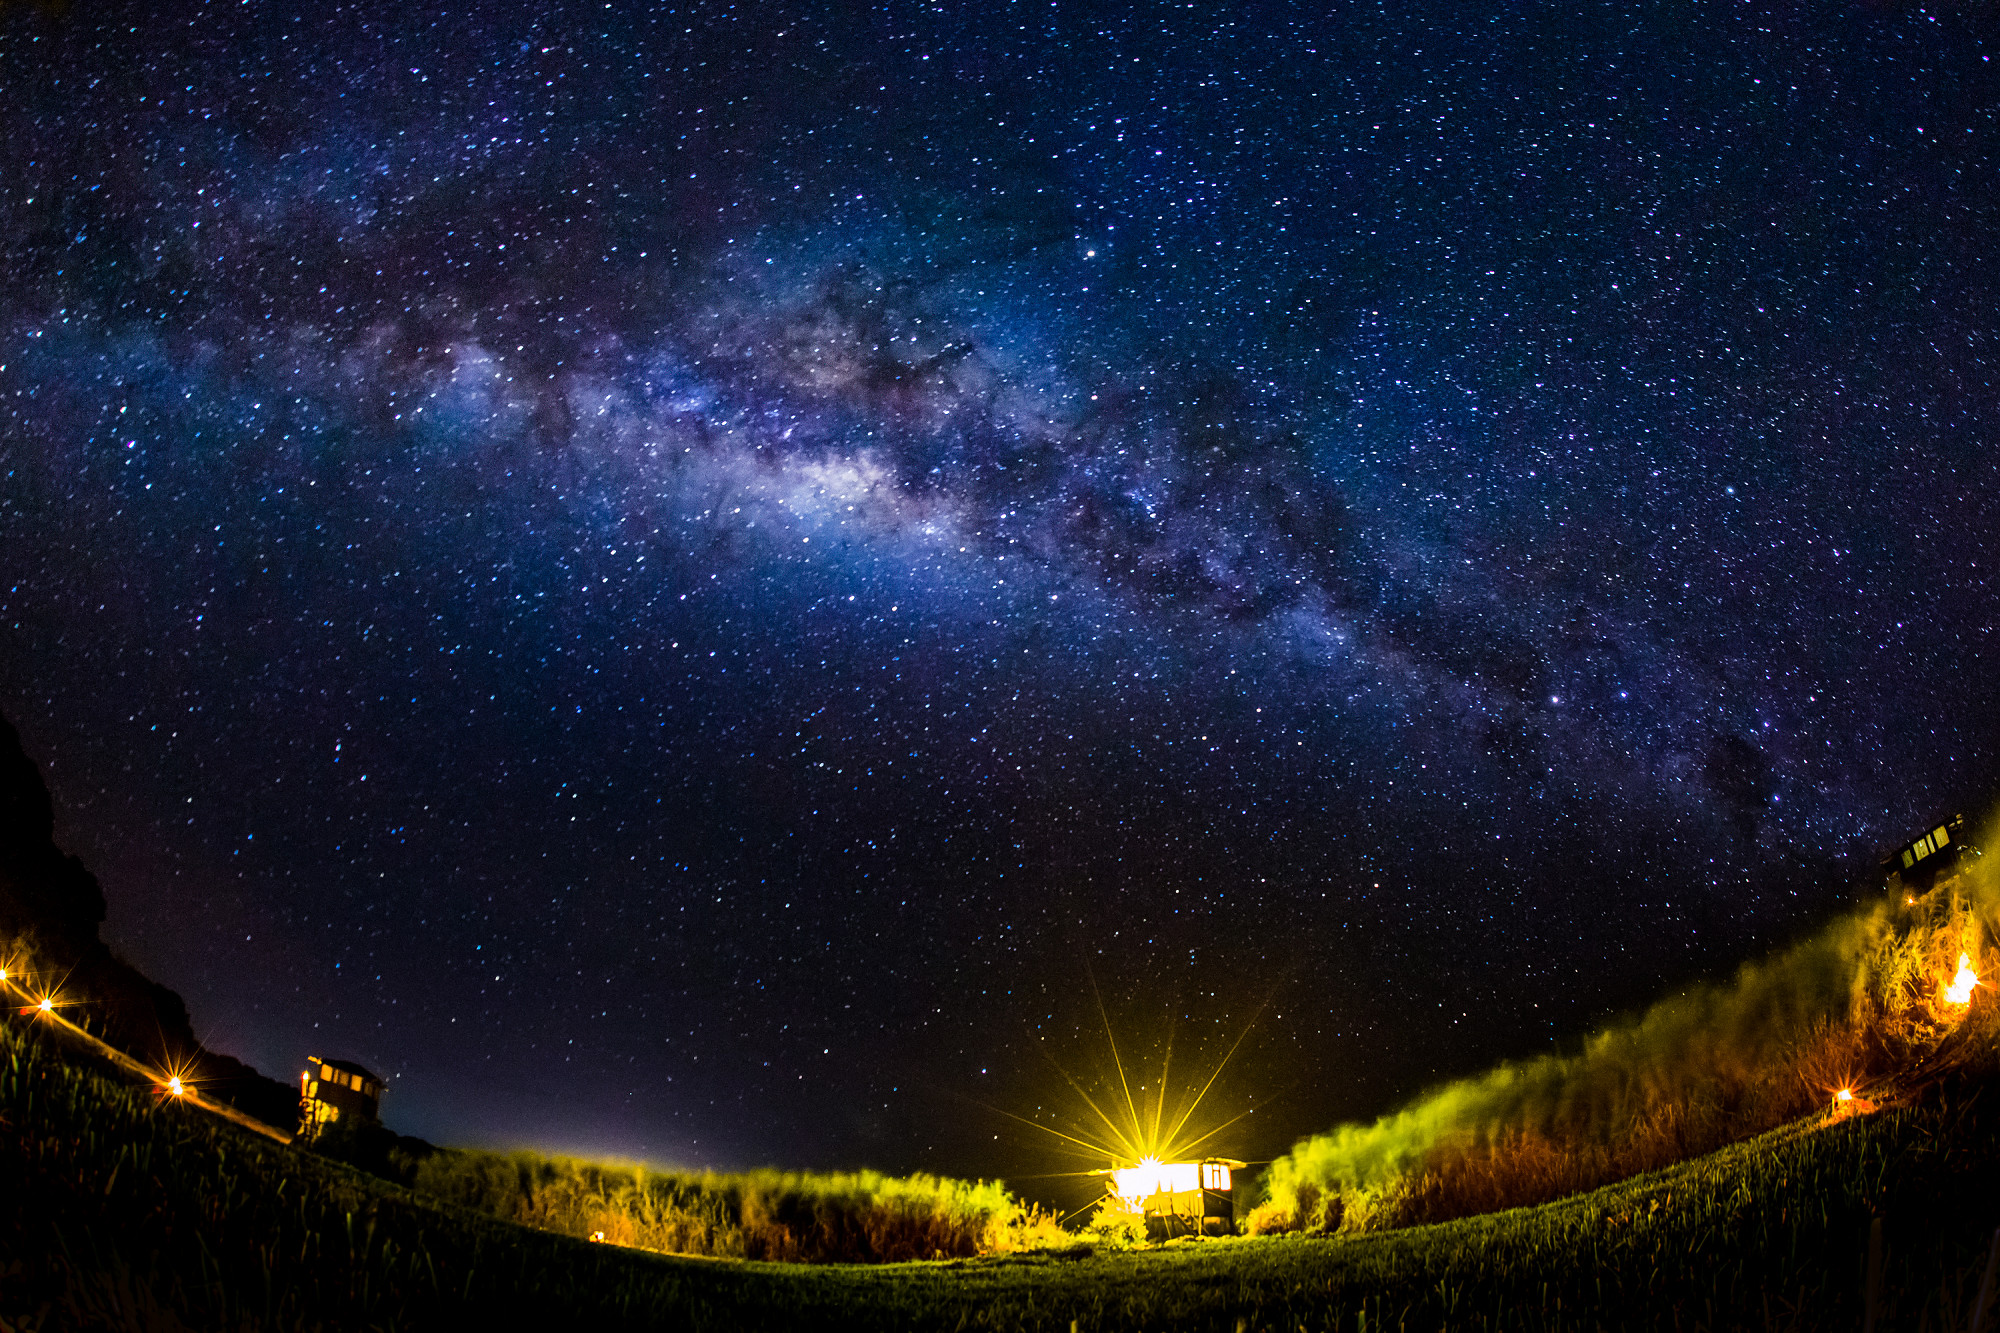 hd-starry-night-sky-wallpaper.png